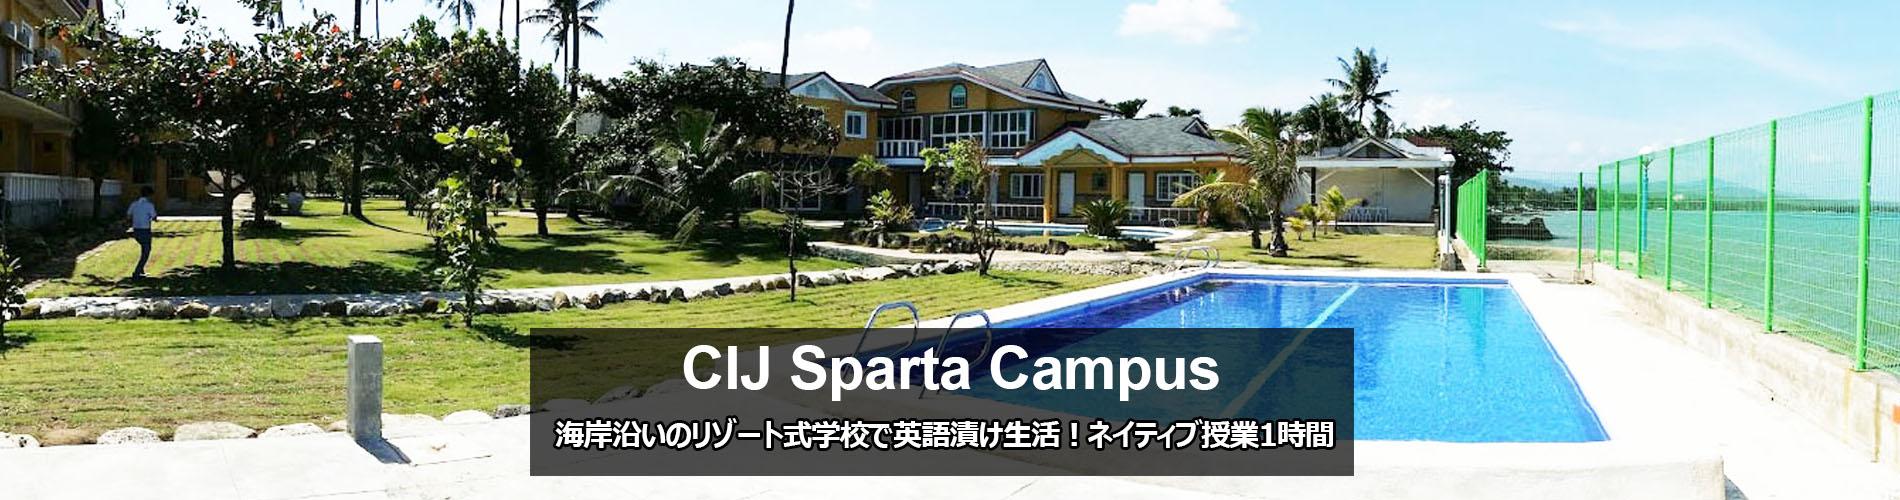 CEBU CIJ Academy Sparta Campus